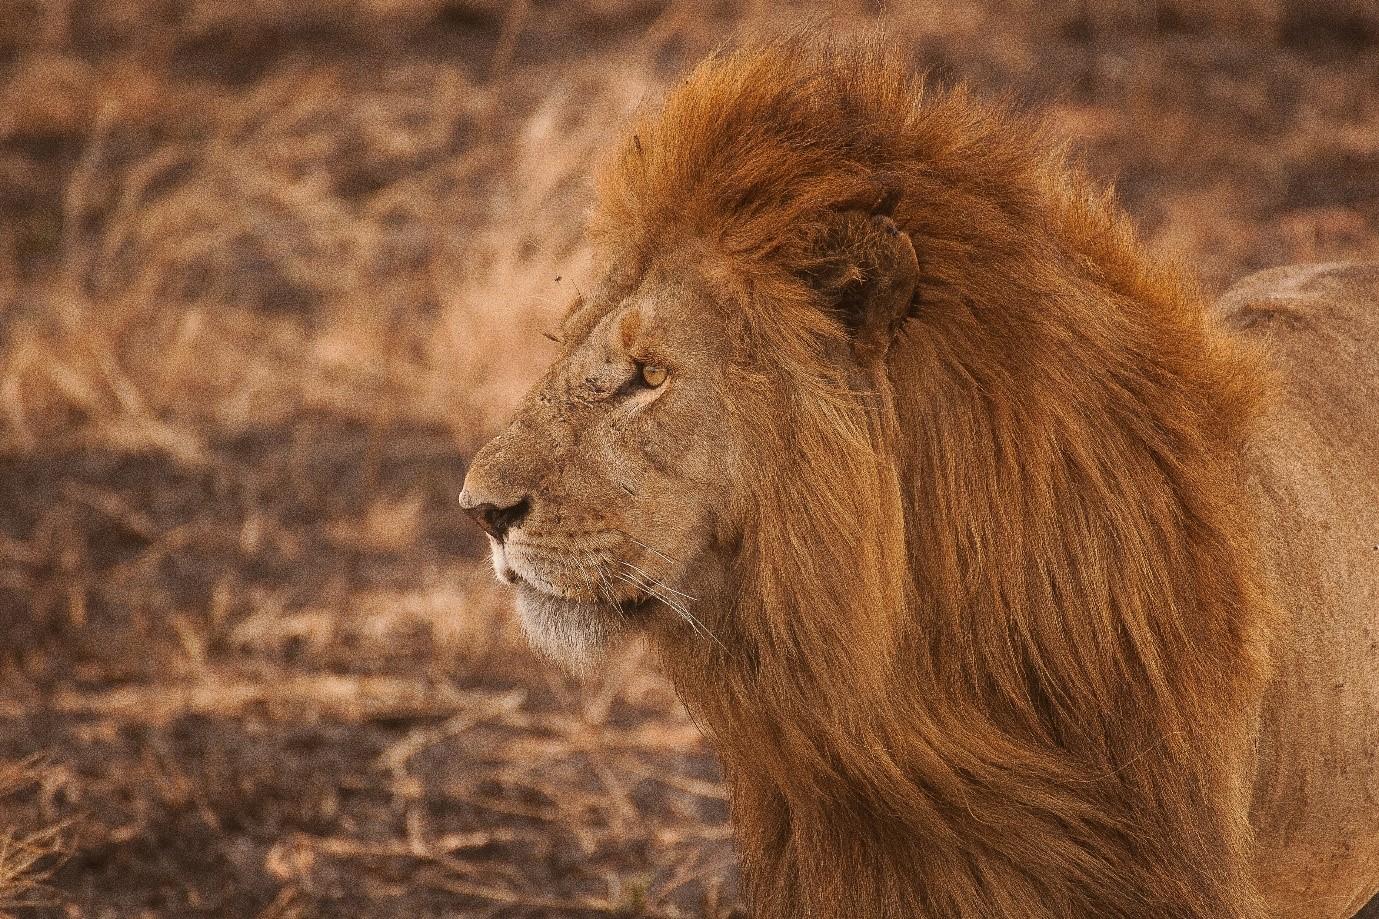 A lion on the Serengeti, Tanzania. Photo by Amar Yashlaha on Unsplash